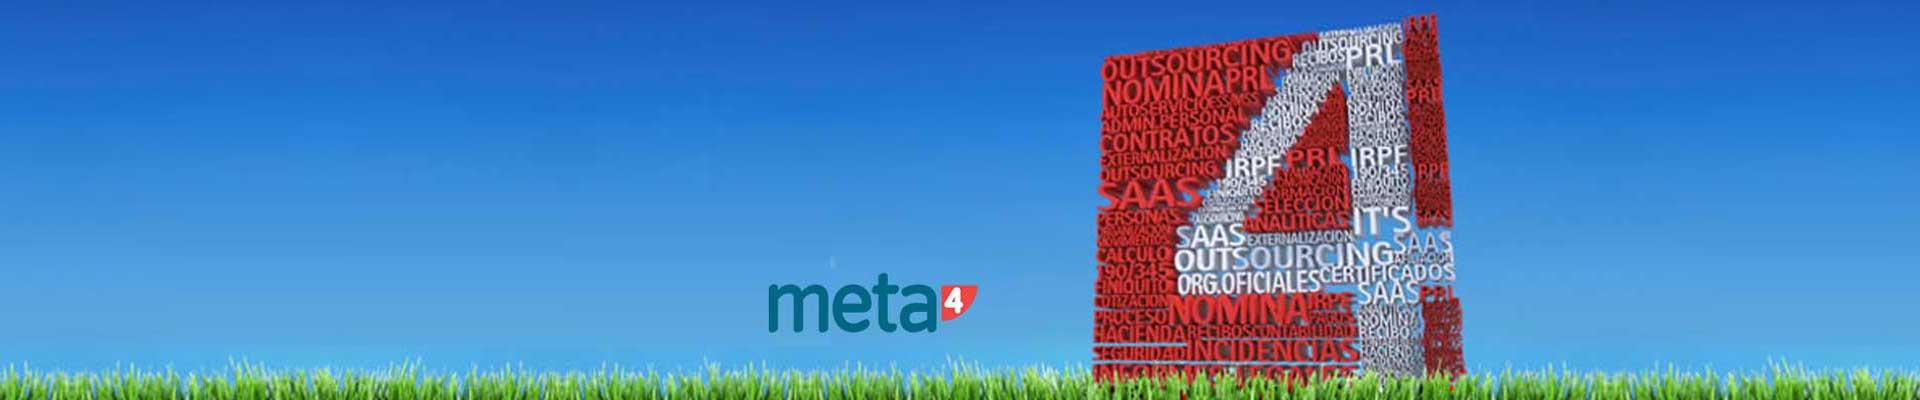 4set y meta4